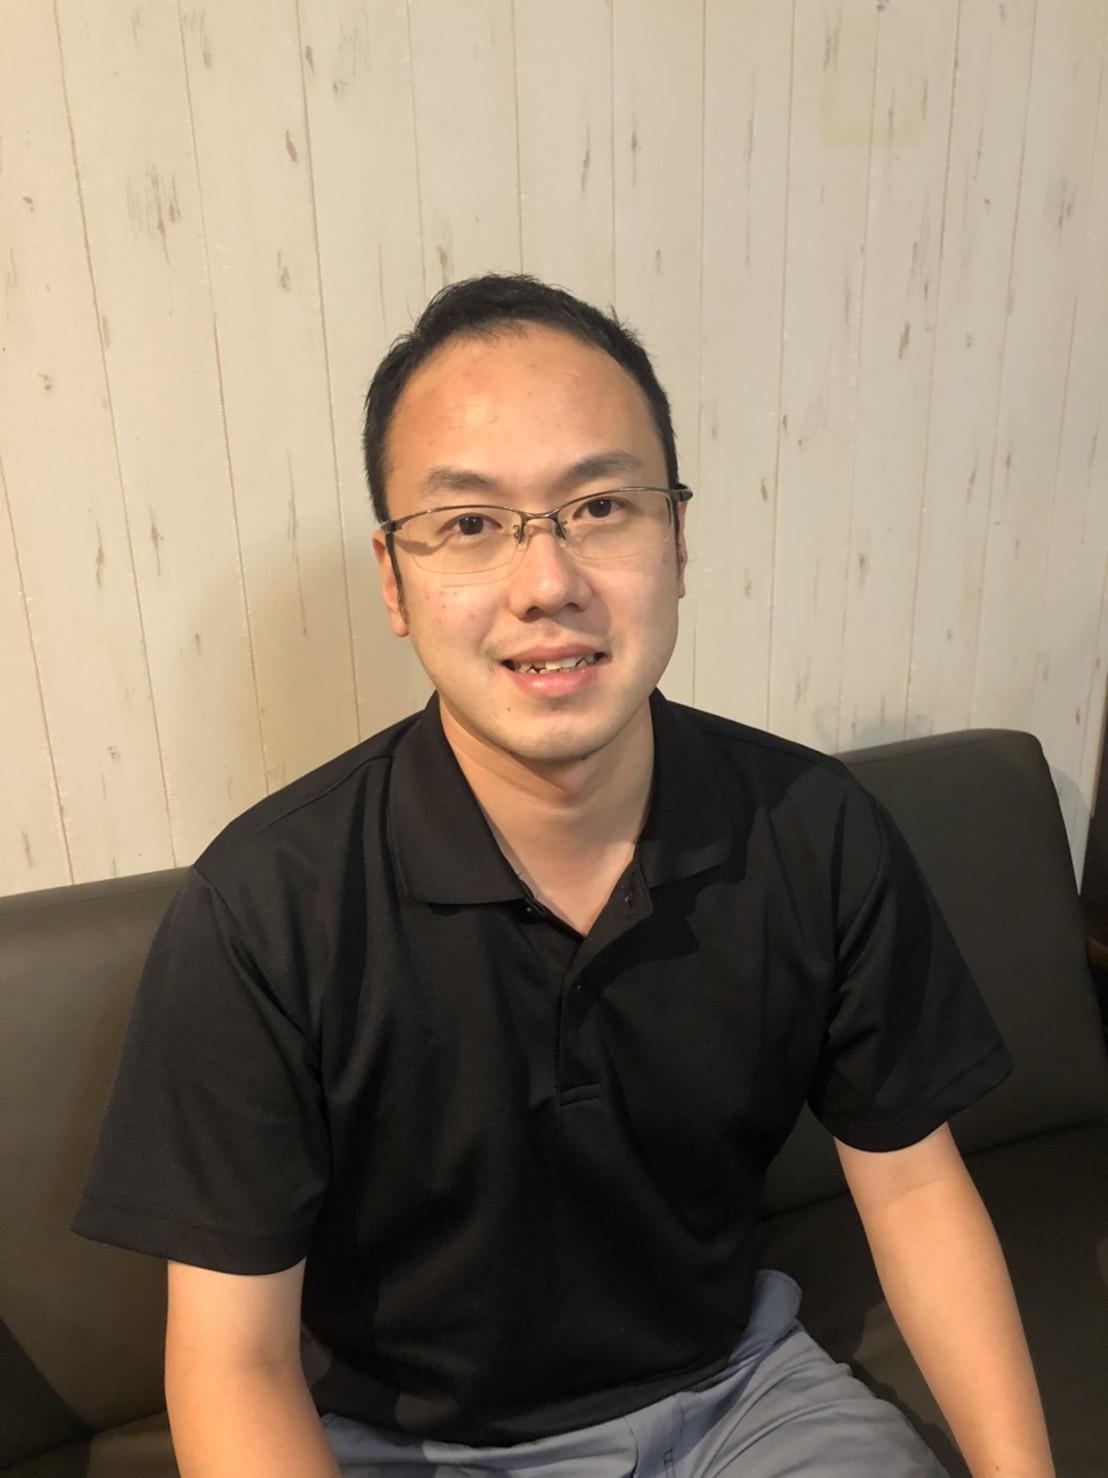 CEO「青木 啓明」